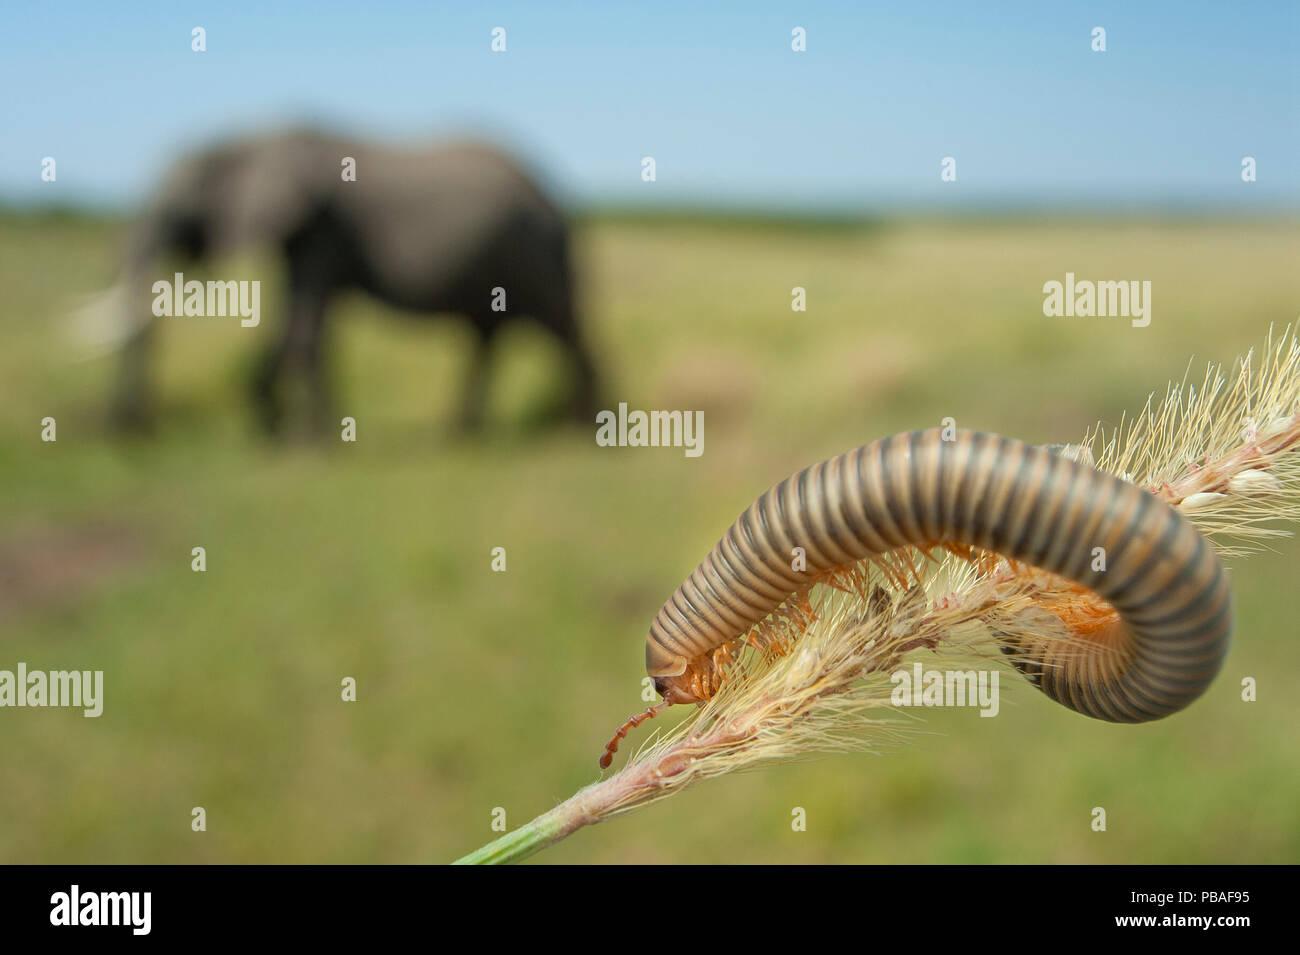 Millipede (Myriapoda) on grass blade, with African elephant (Loxodonta africana) in background Masai Mara National Park, Kenya. - Stock Image